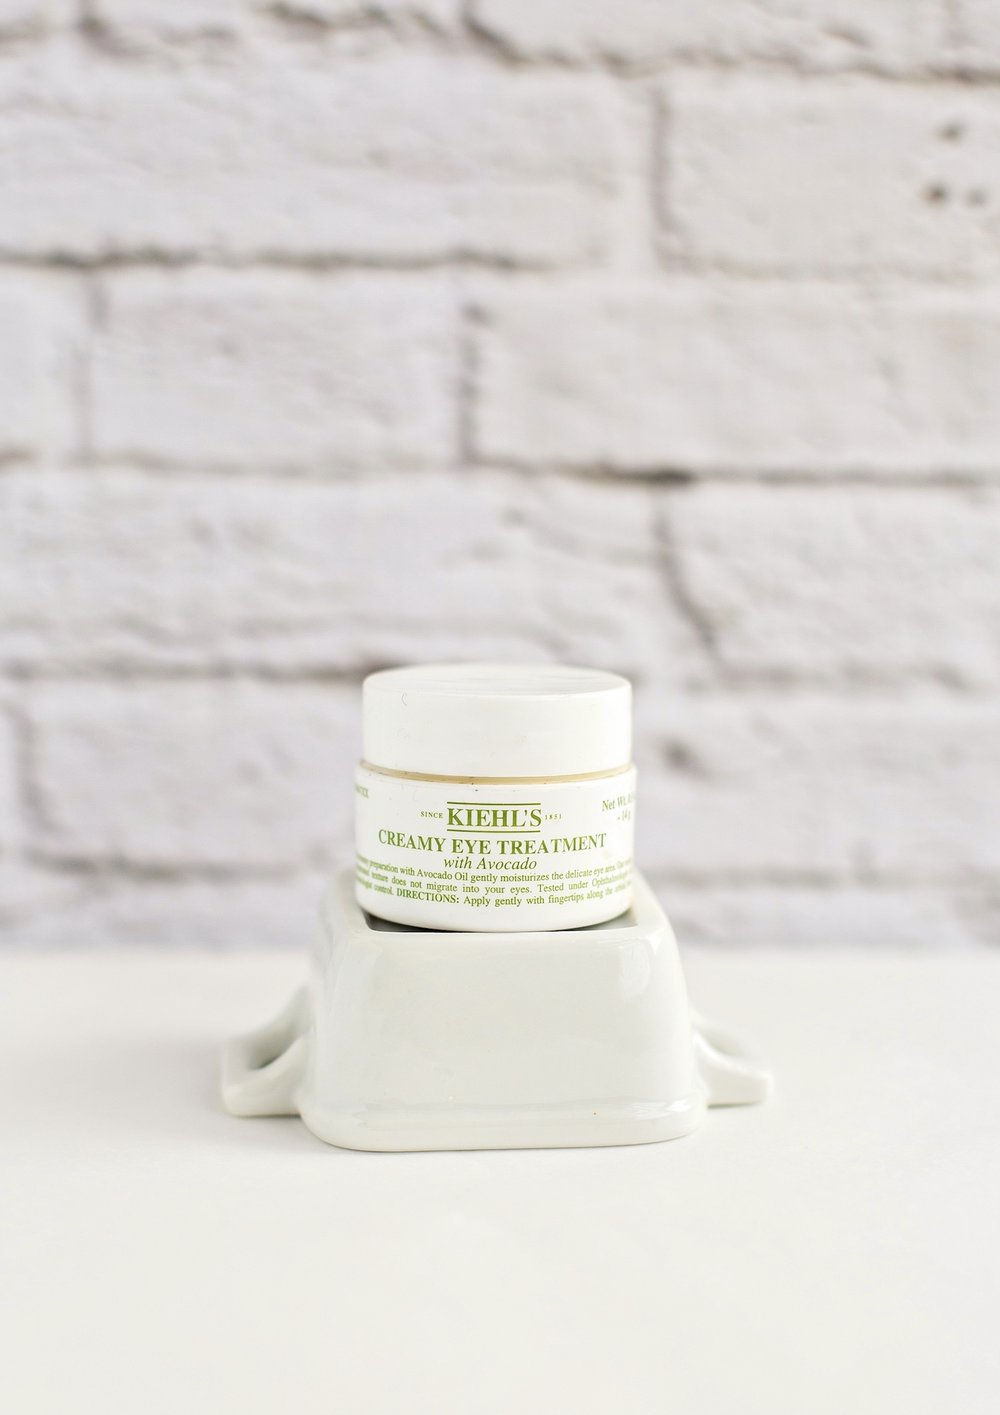 New Beauty Products I'm Loving - Kiehl's Creamy Eye Treatment | TrufflesandTrends.com